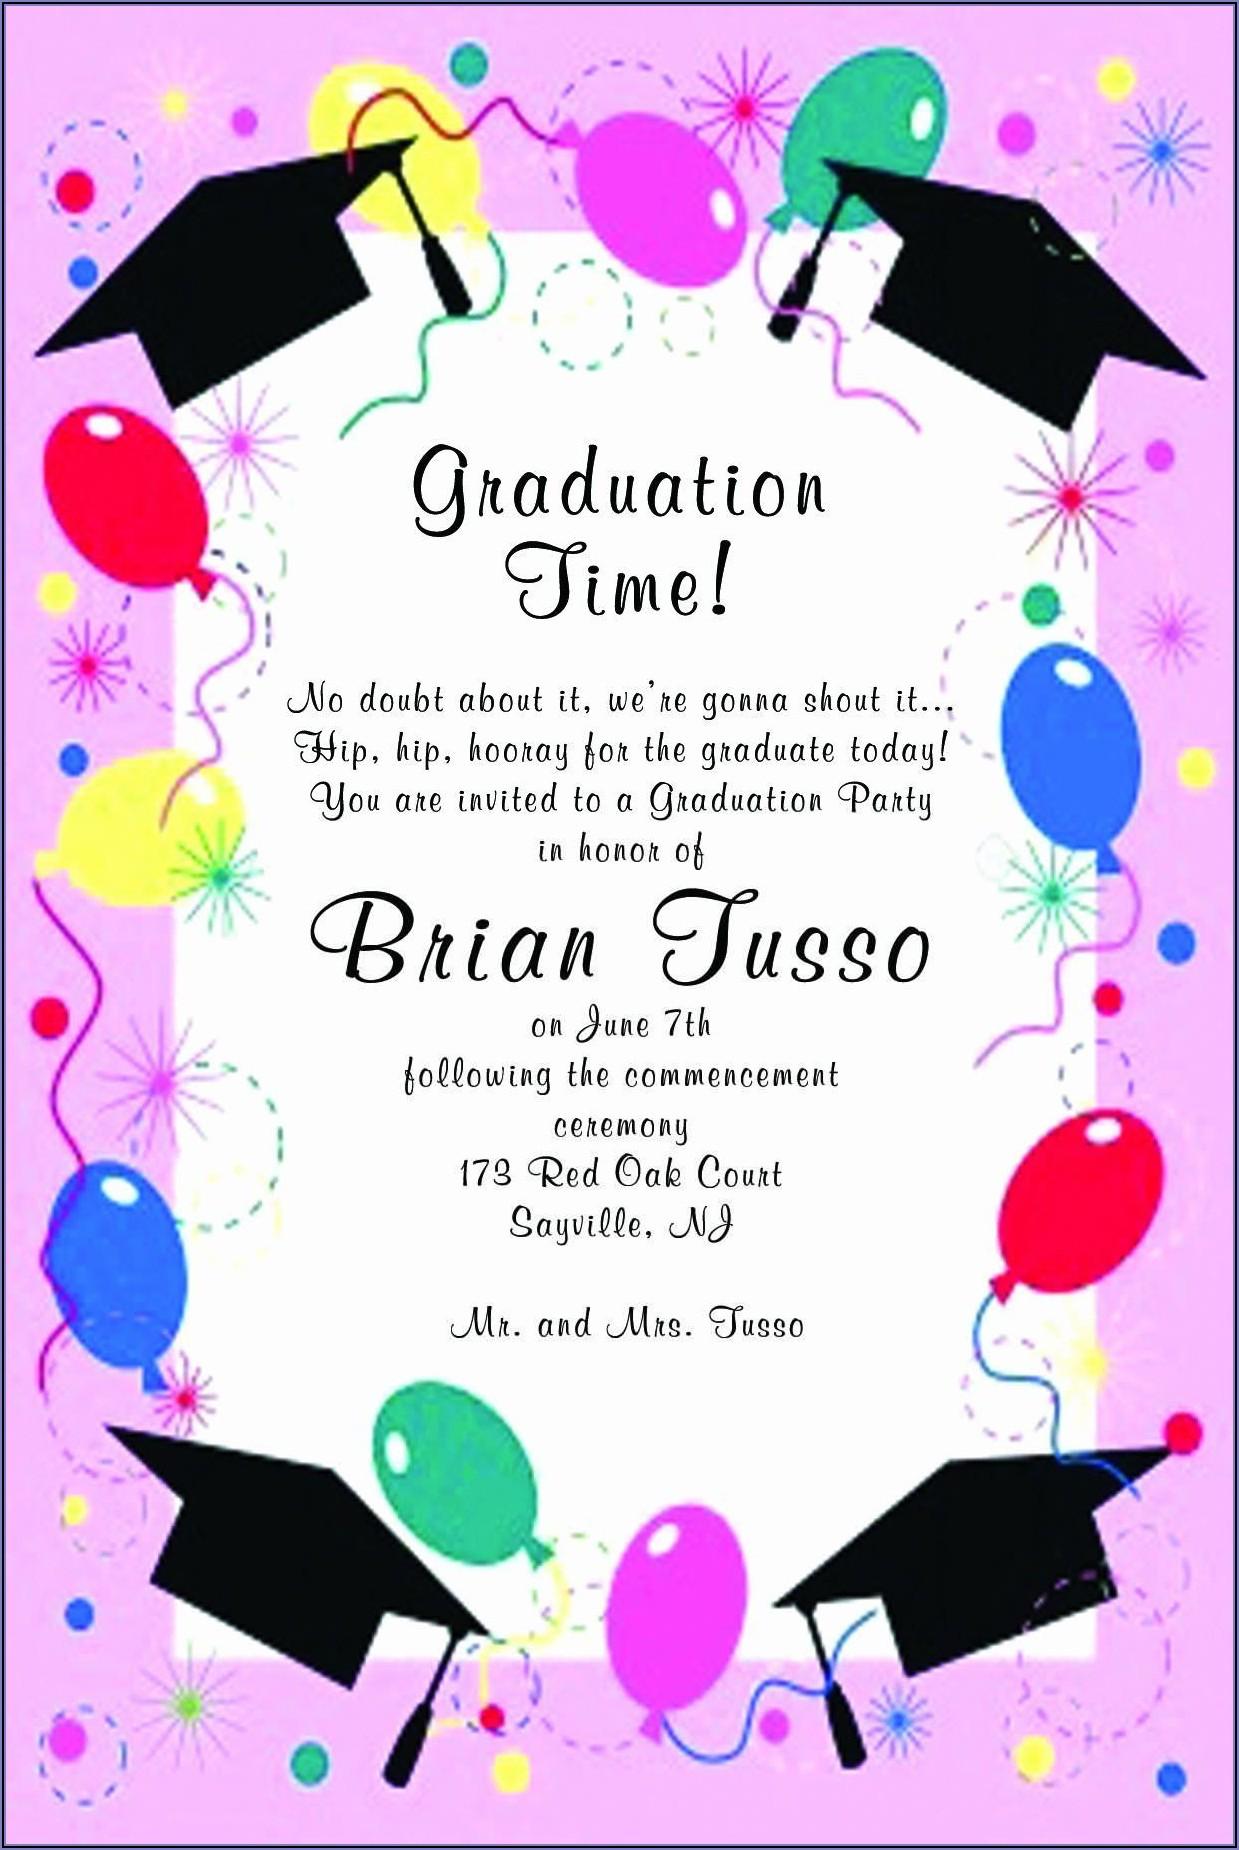 Graduation Ceremony Invitation Wording